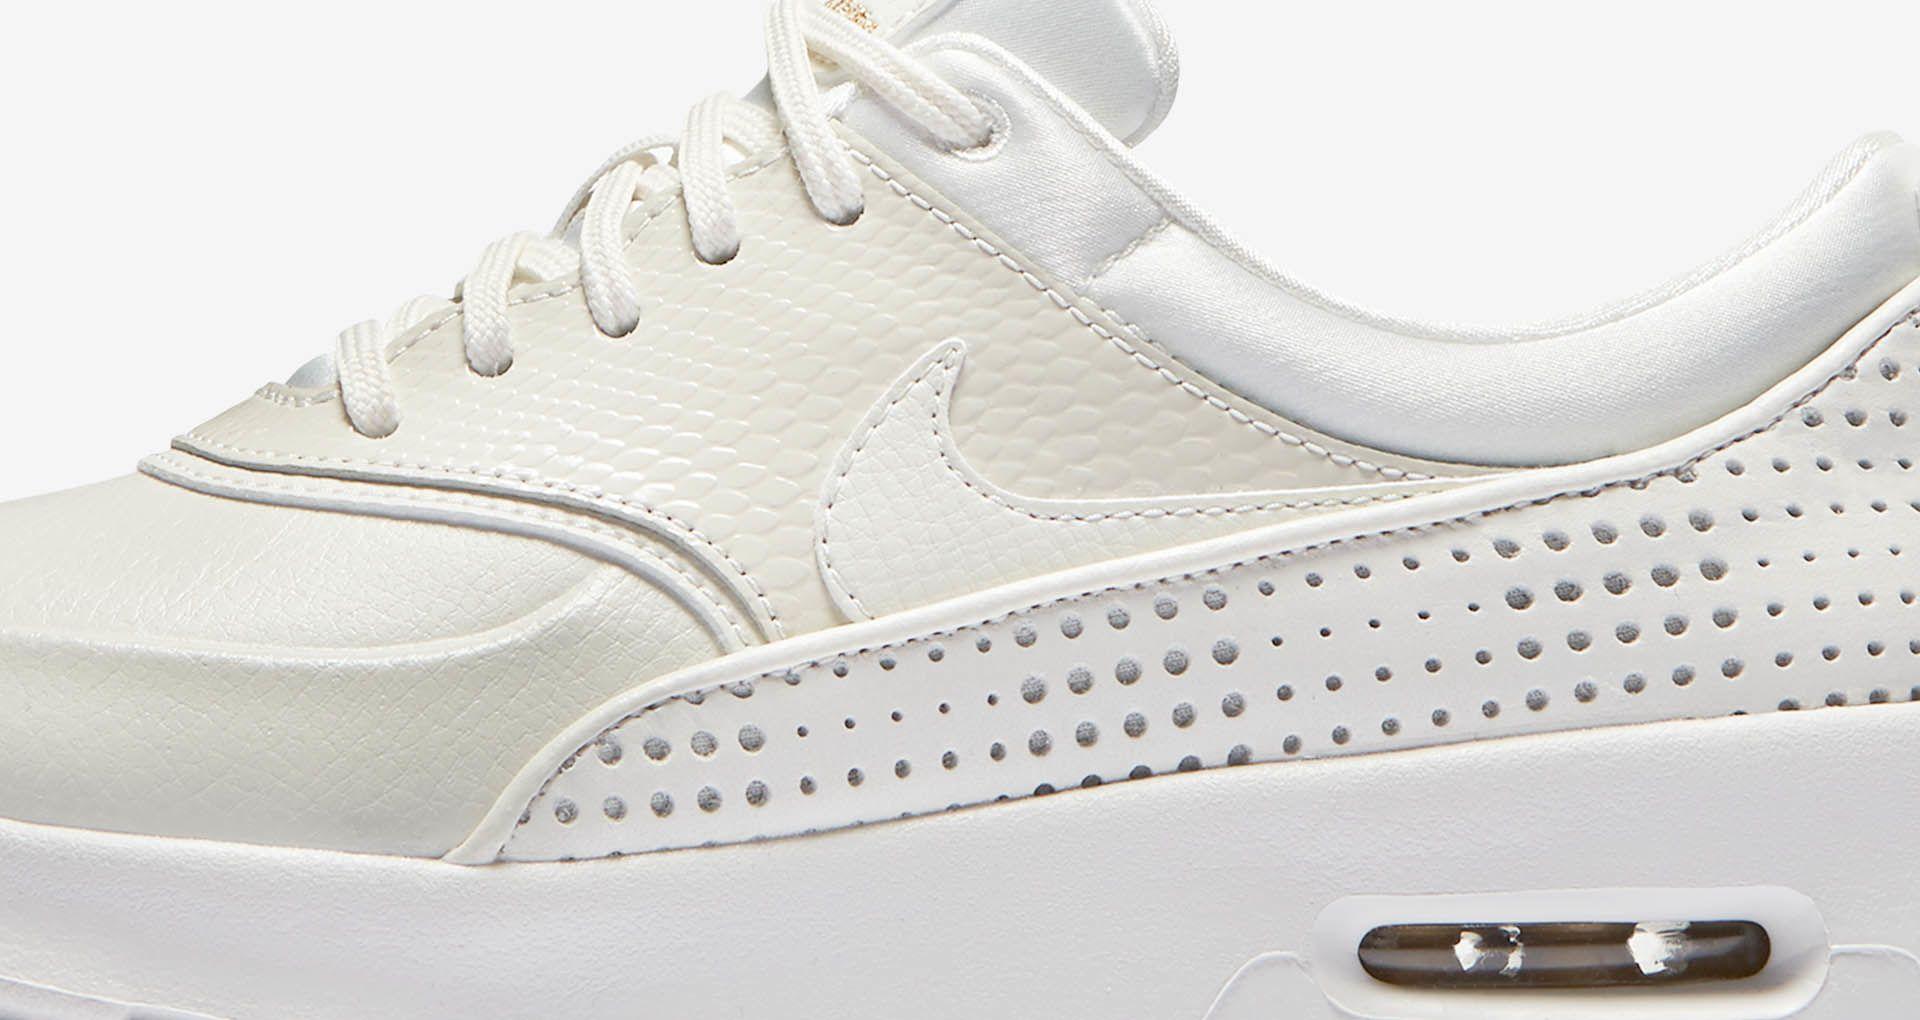 Women's Nike Air Max Thea Premium 'Summit White & Metallic